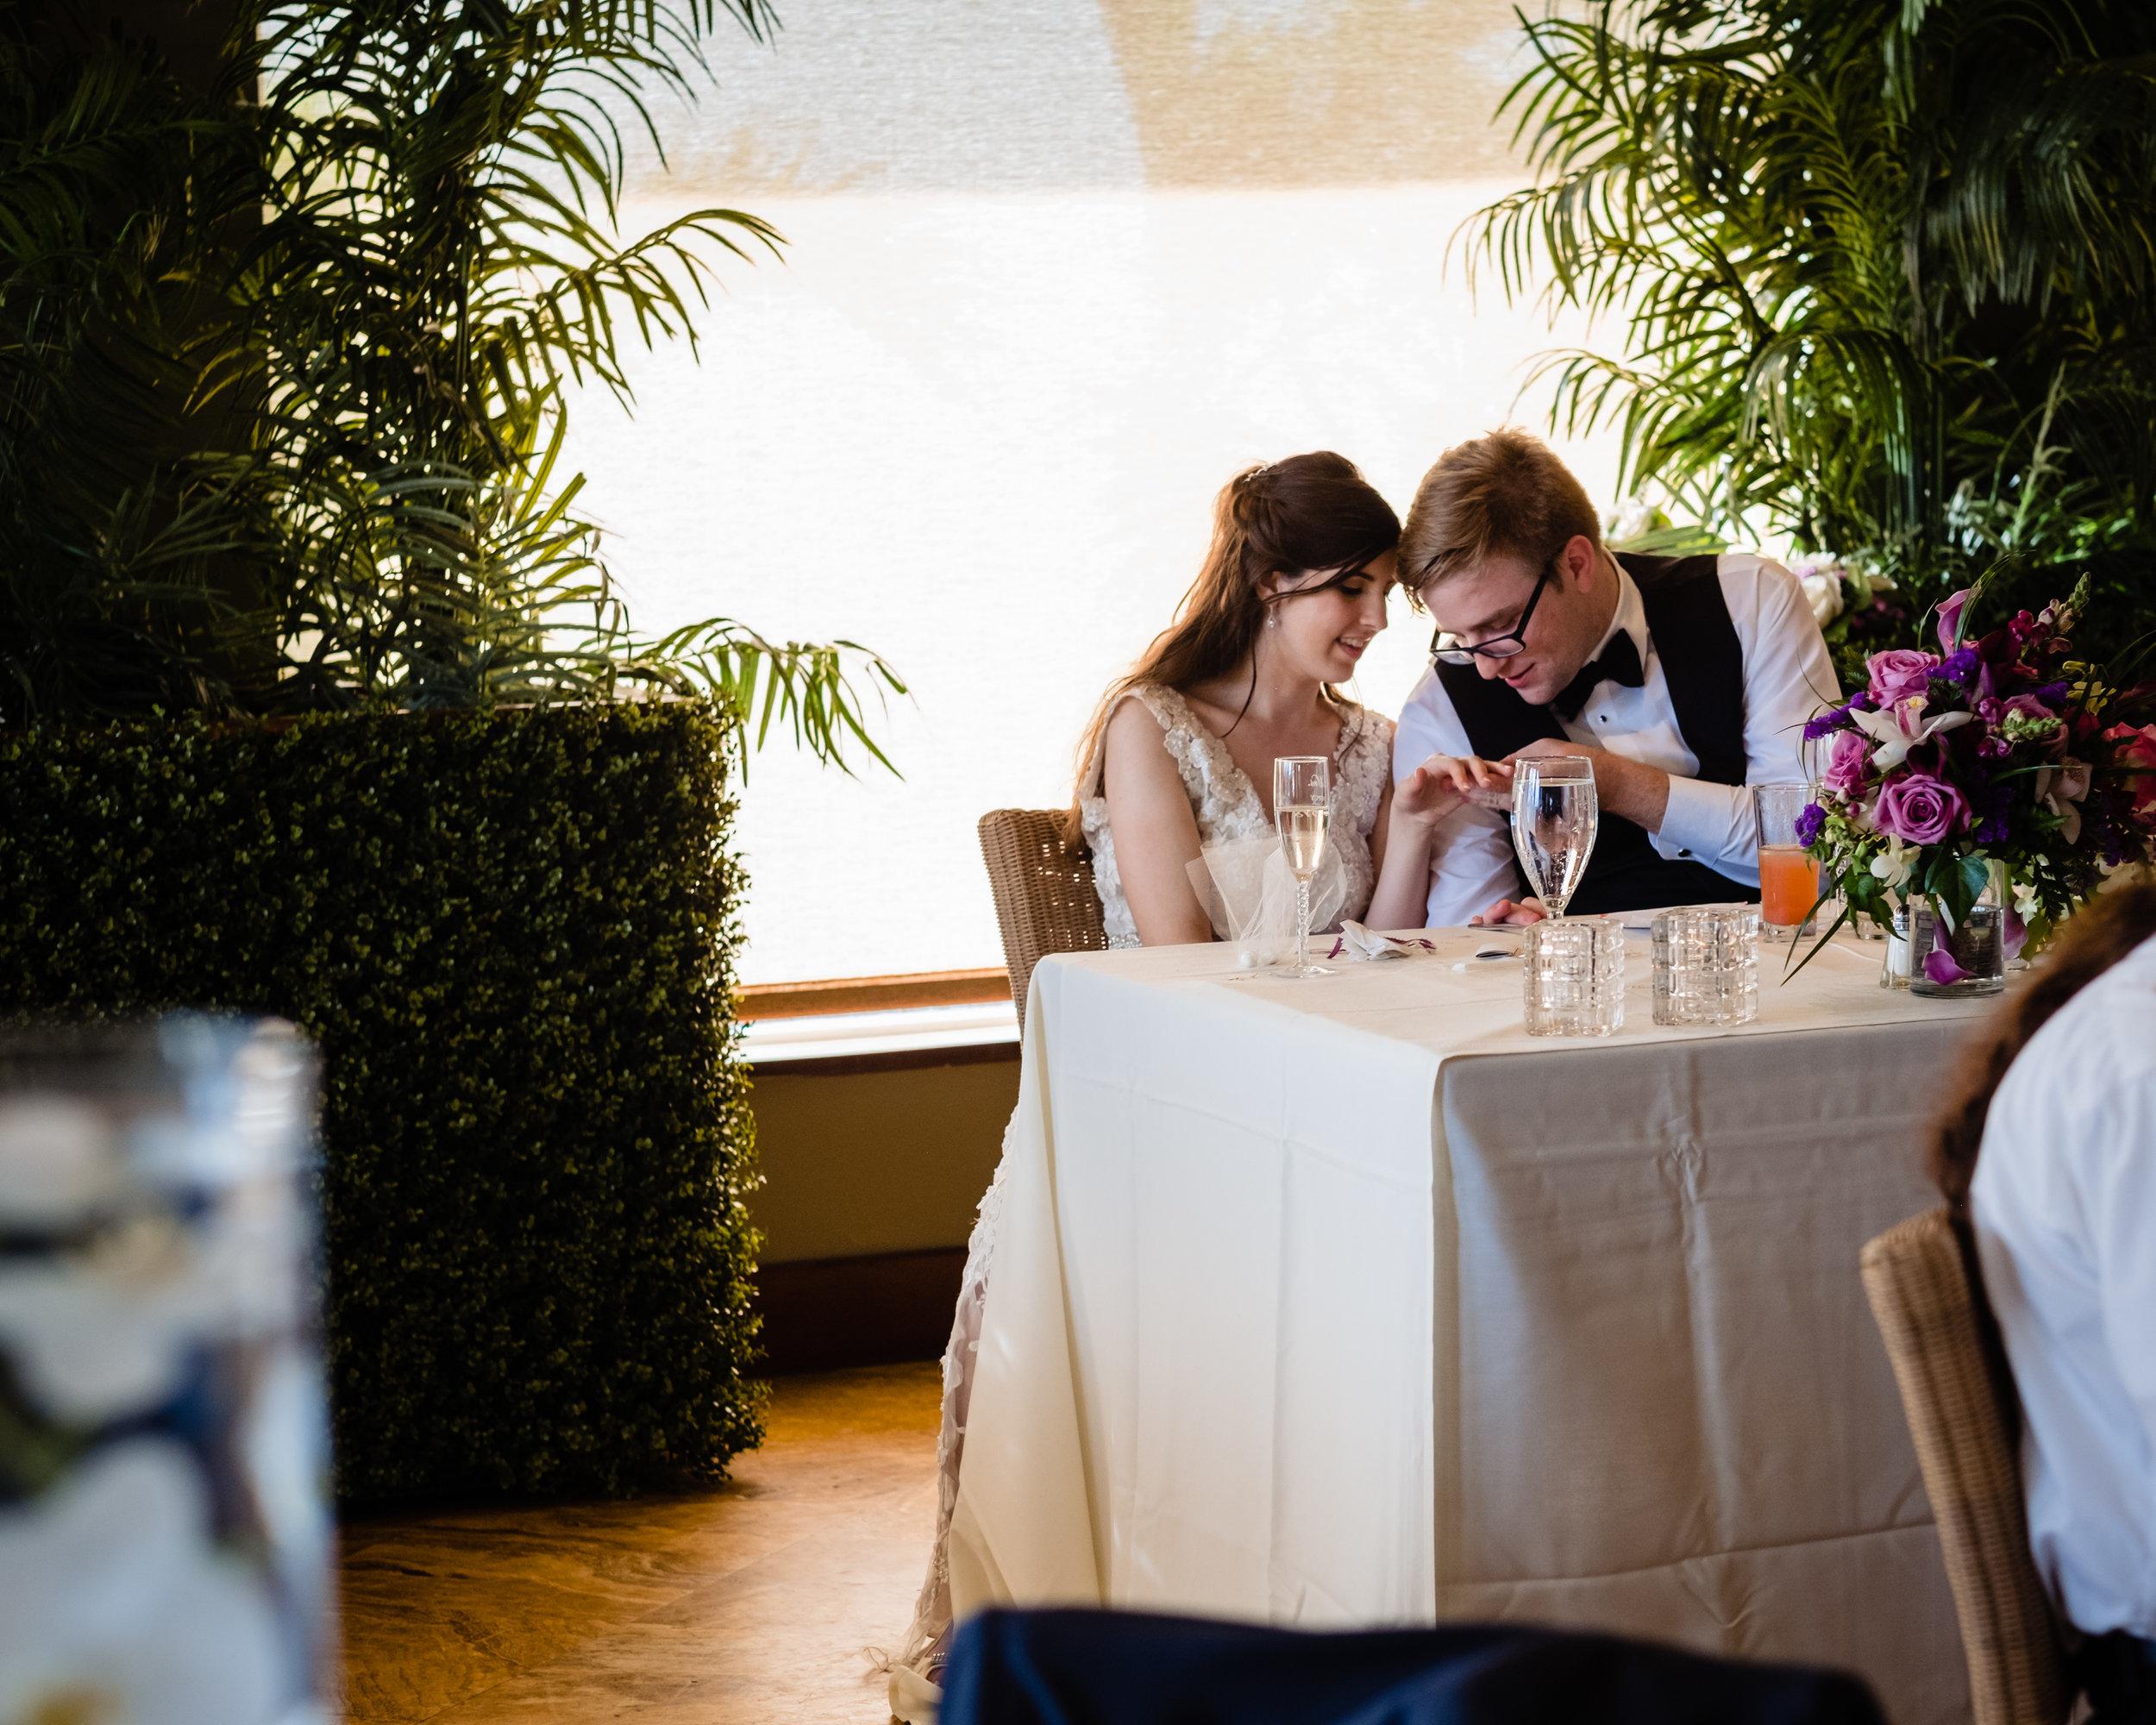 HAH_Zoe and Daniel_Clearwater Wedding_653_2018.jpg